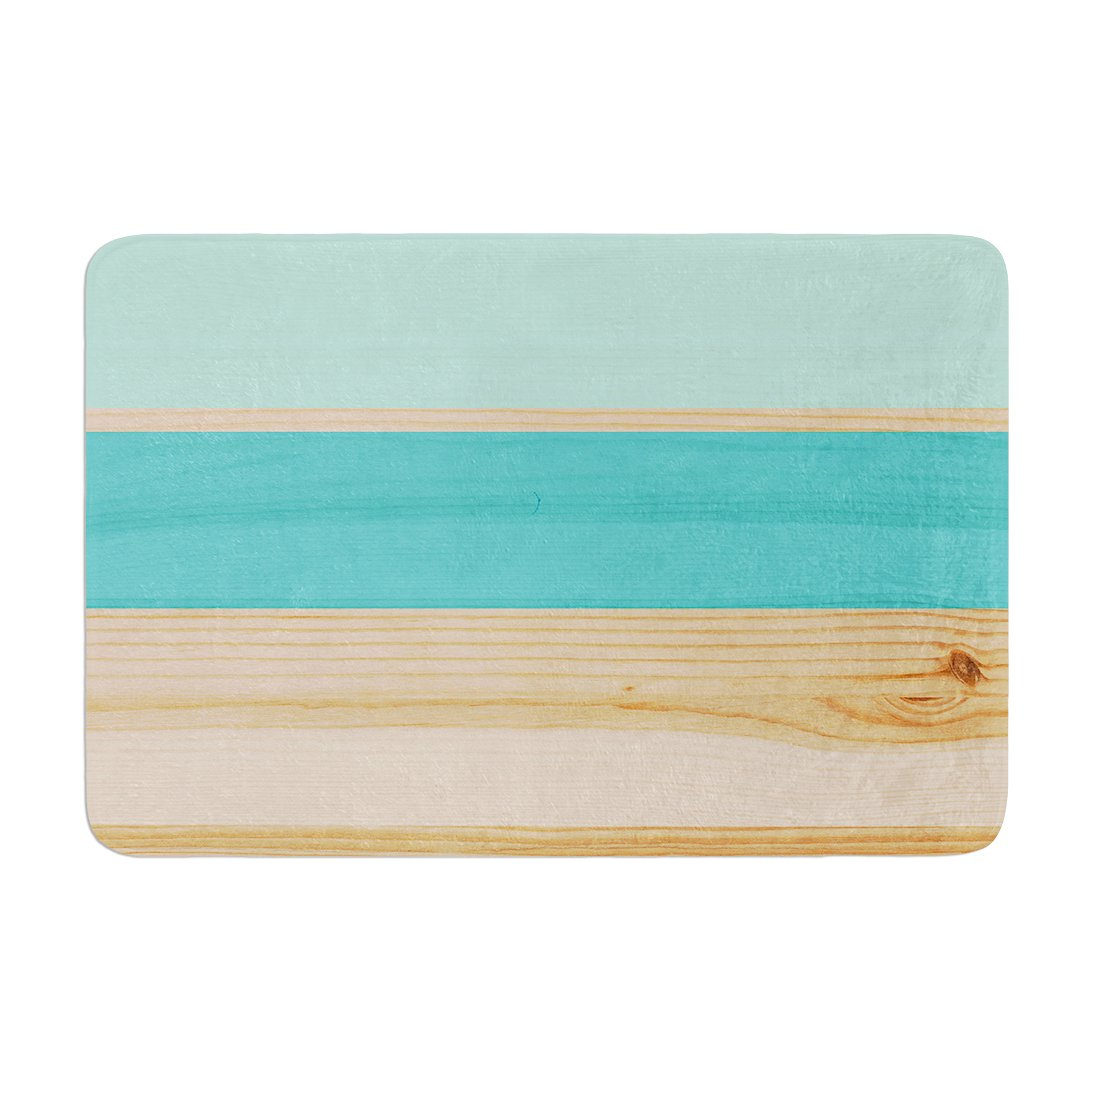 17 by 24 Blue Green Teal Wood Memory Foam Bath Mat Kess InHouse Kess Original Spring Swatch